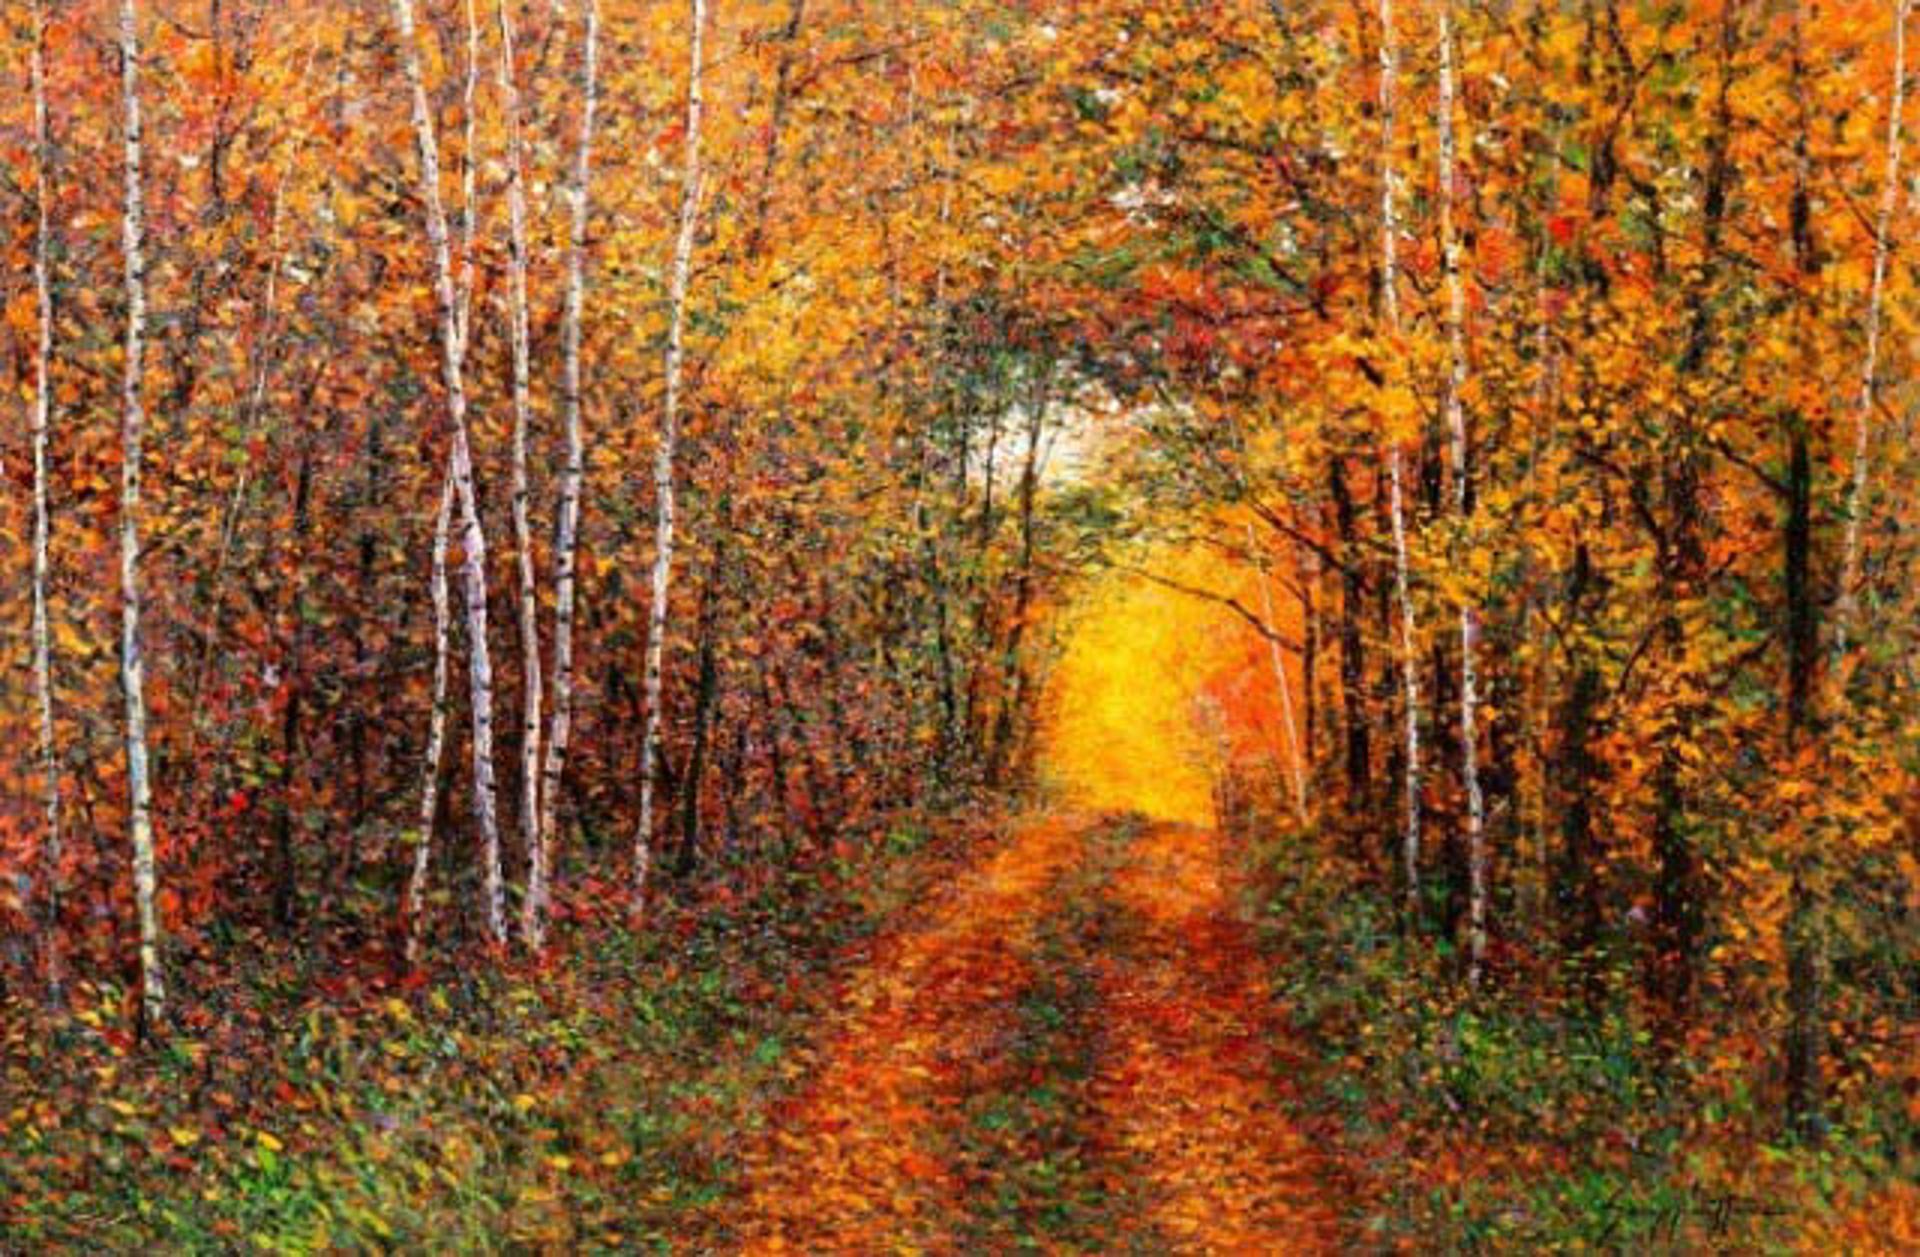 An Autumn Lane by James Scoppettone